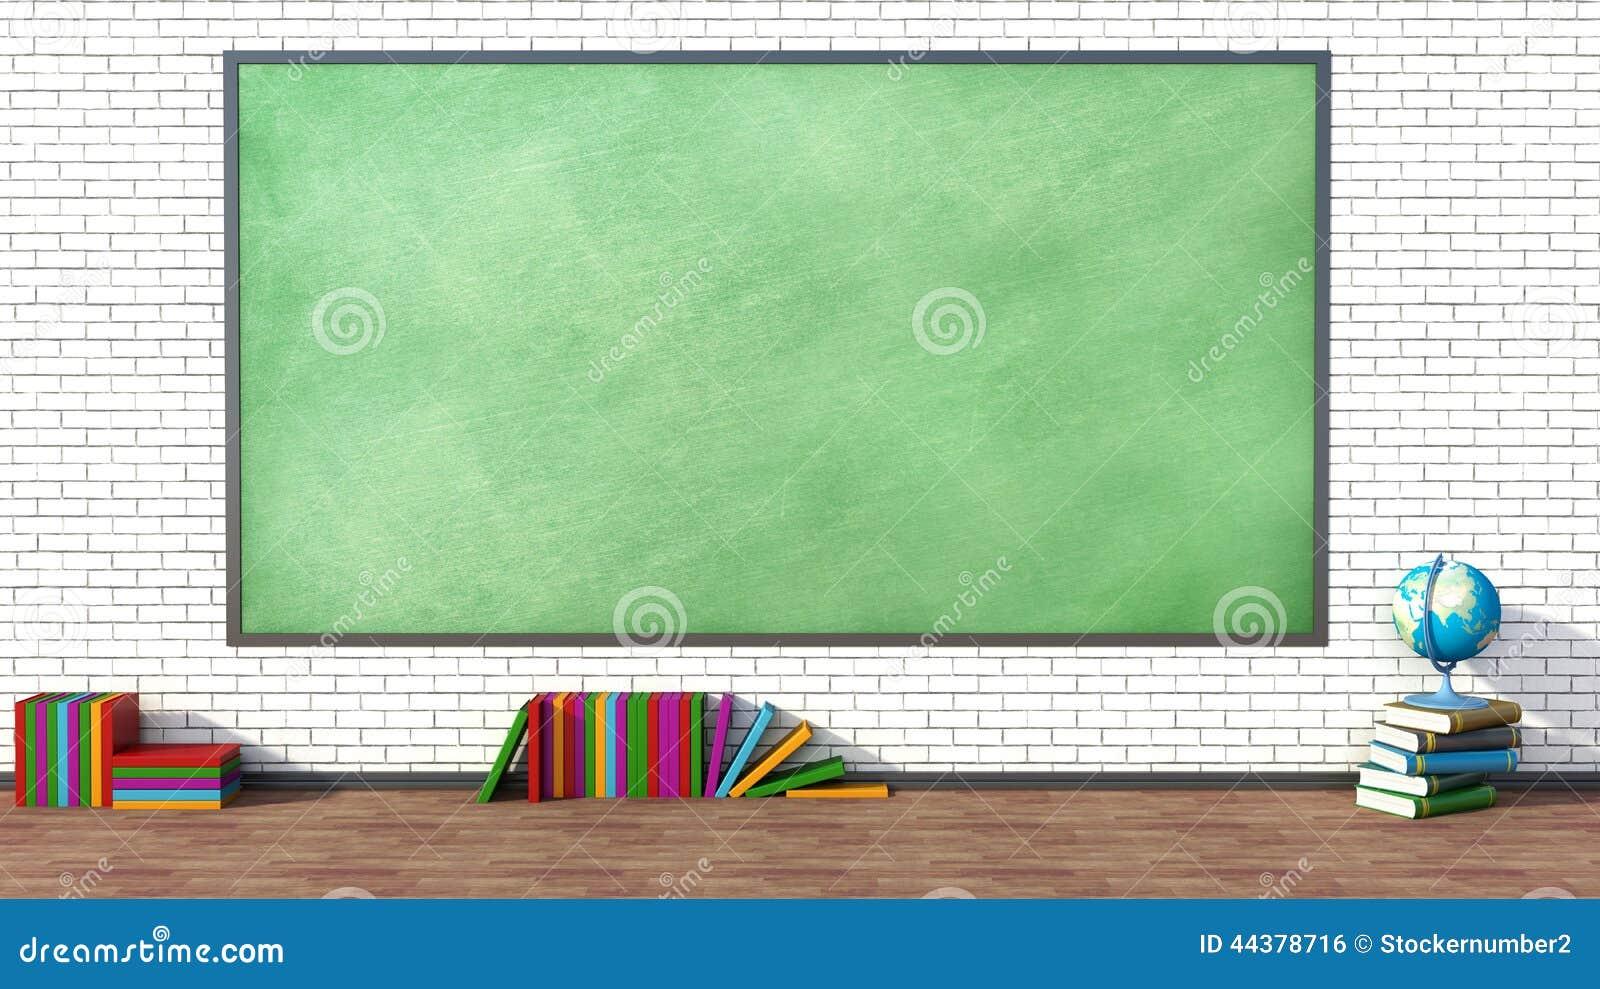 Blackboard Innovative Classroom ~ Classroom with green blackboard against brick wall stock